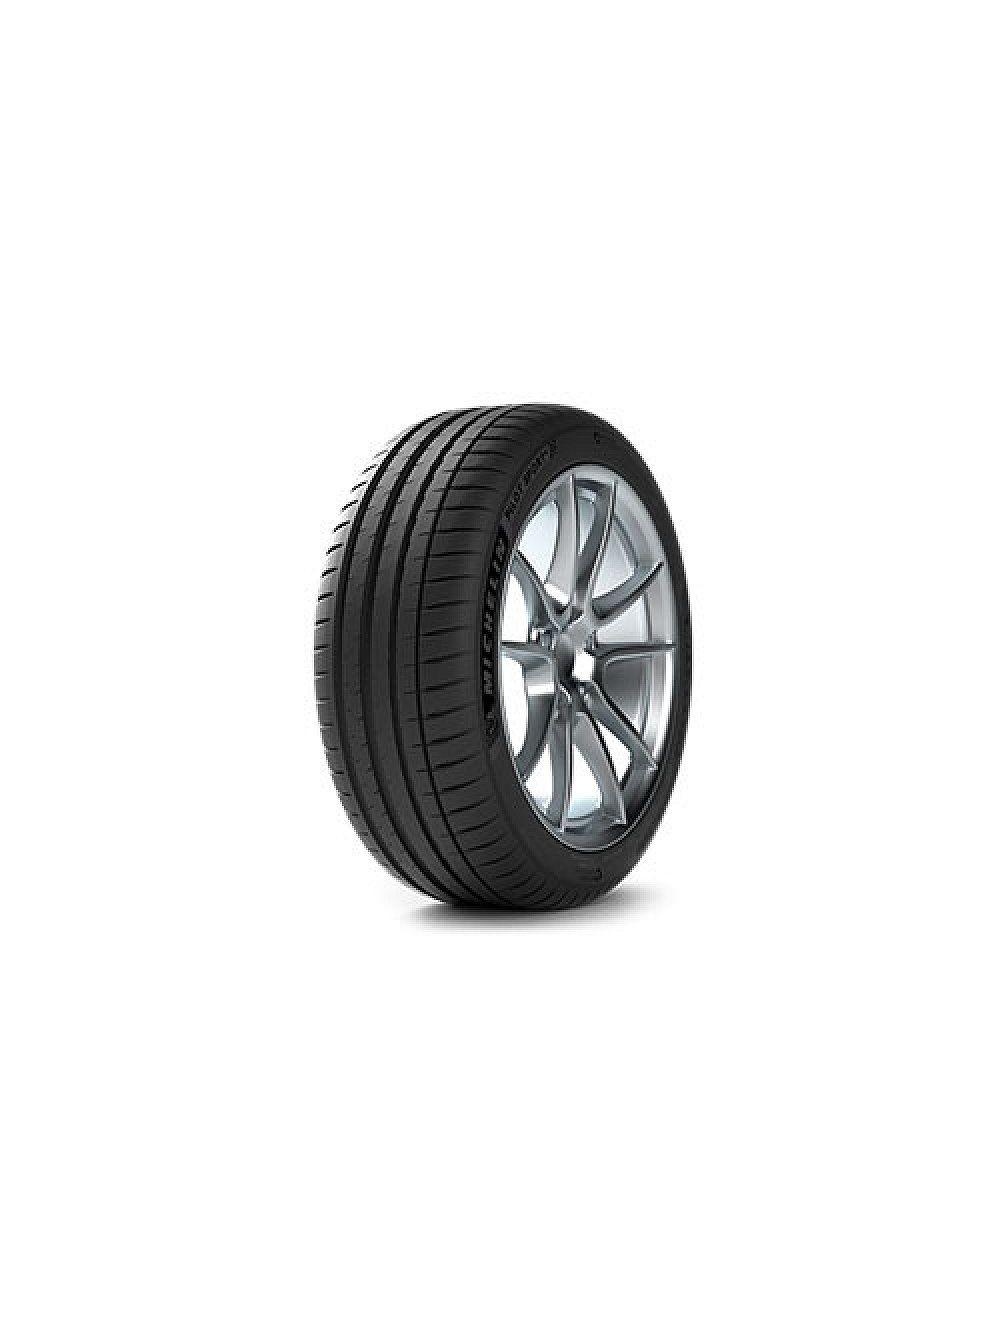 Michelin 225/35R19 Y Pilot Sport4 S XL ZP Nyári gumi